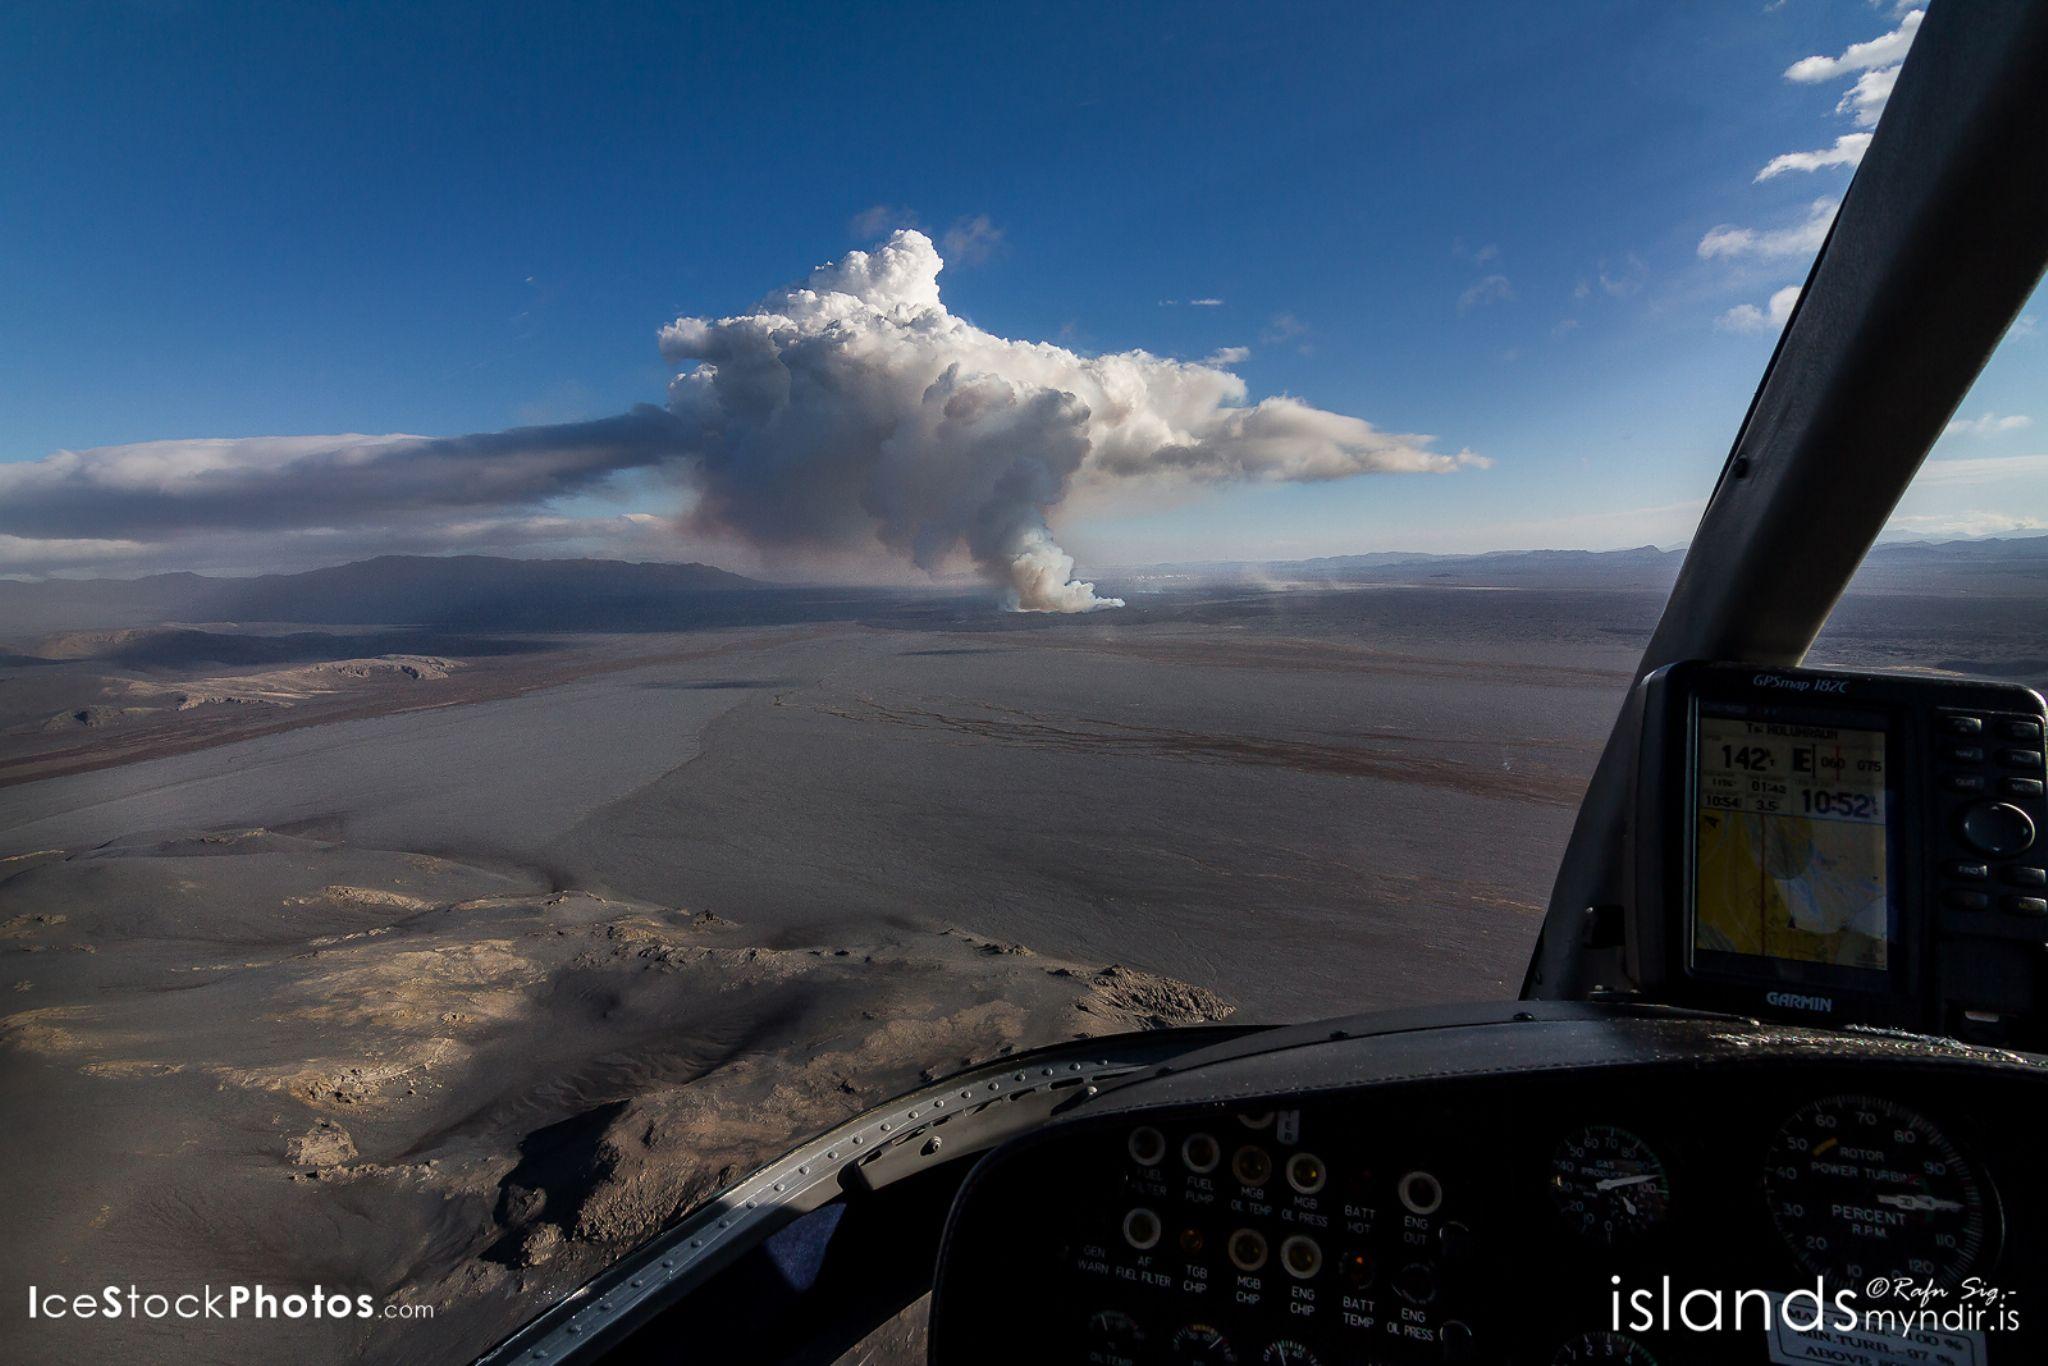 """Flying to the Volcanic Eruption at Holuhraun with Norðurflug"" - #Iceland by Rafn Sig,-  @ Discover Wild Iceland.com"